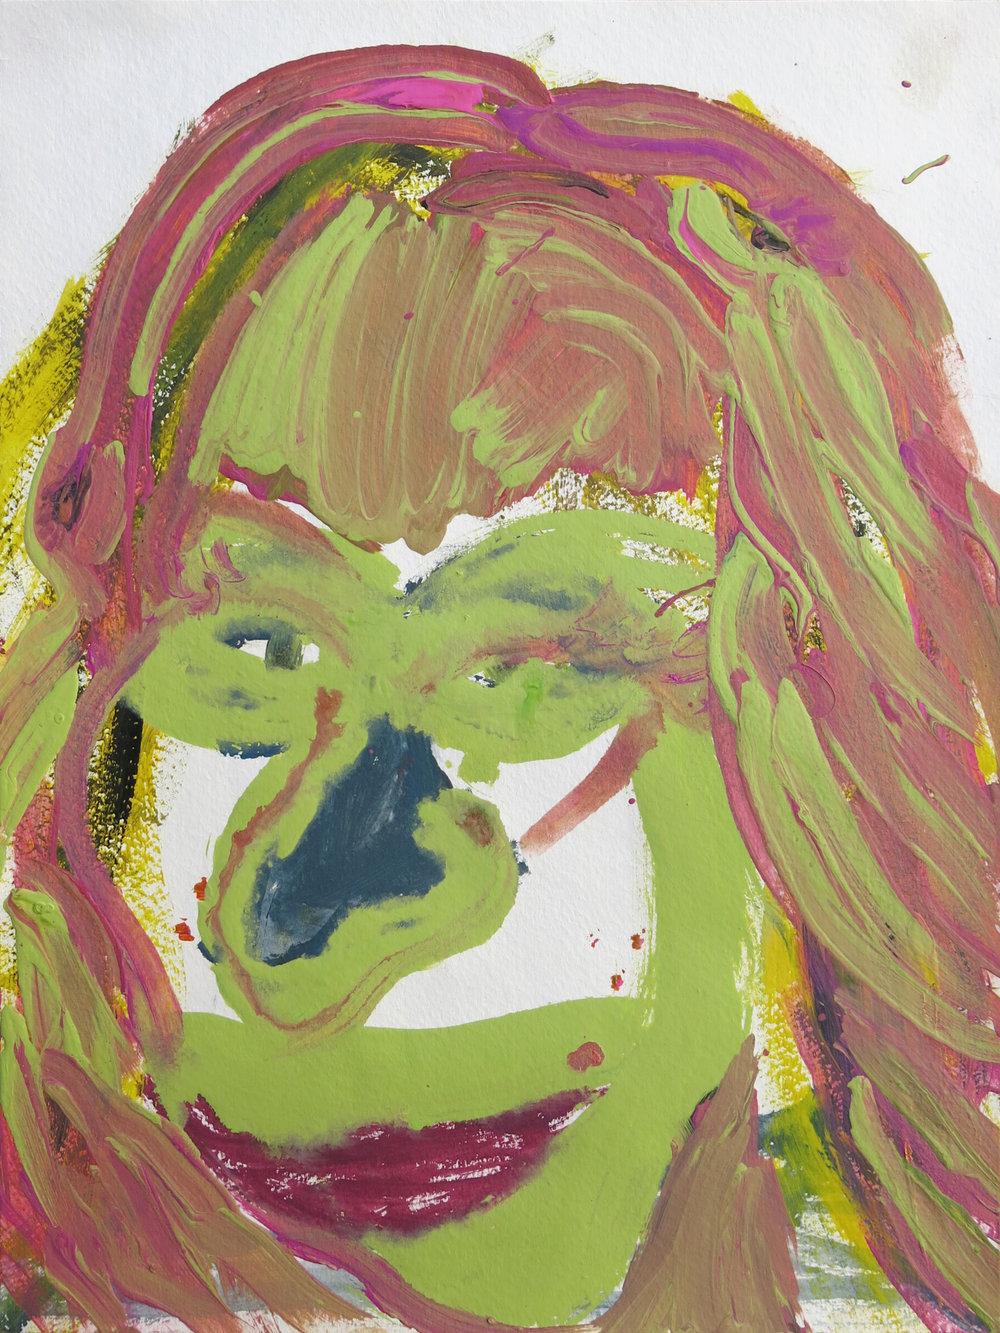 Barbra Streisand Portrait #75